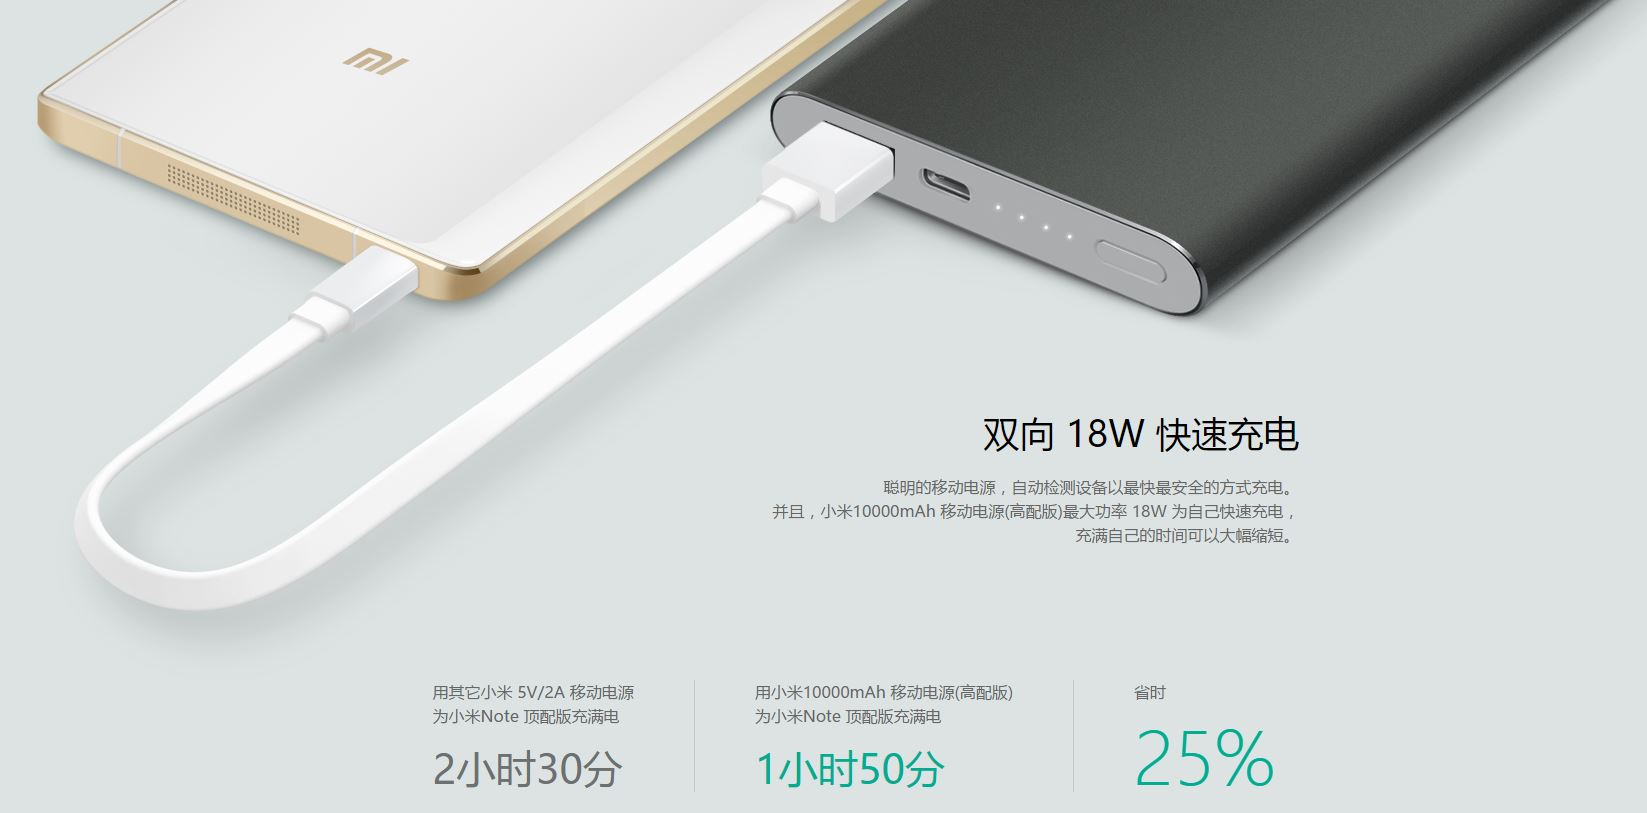 xiaomi-type-c-power-bank-3